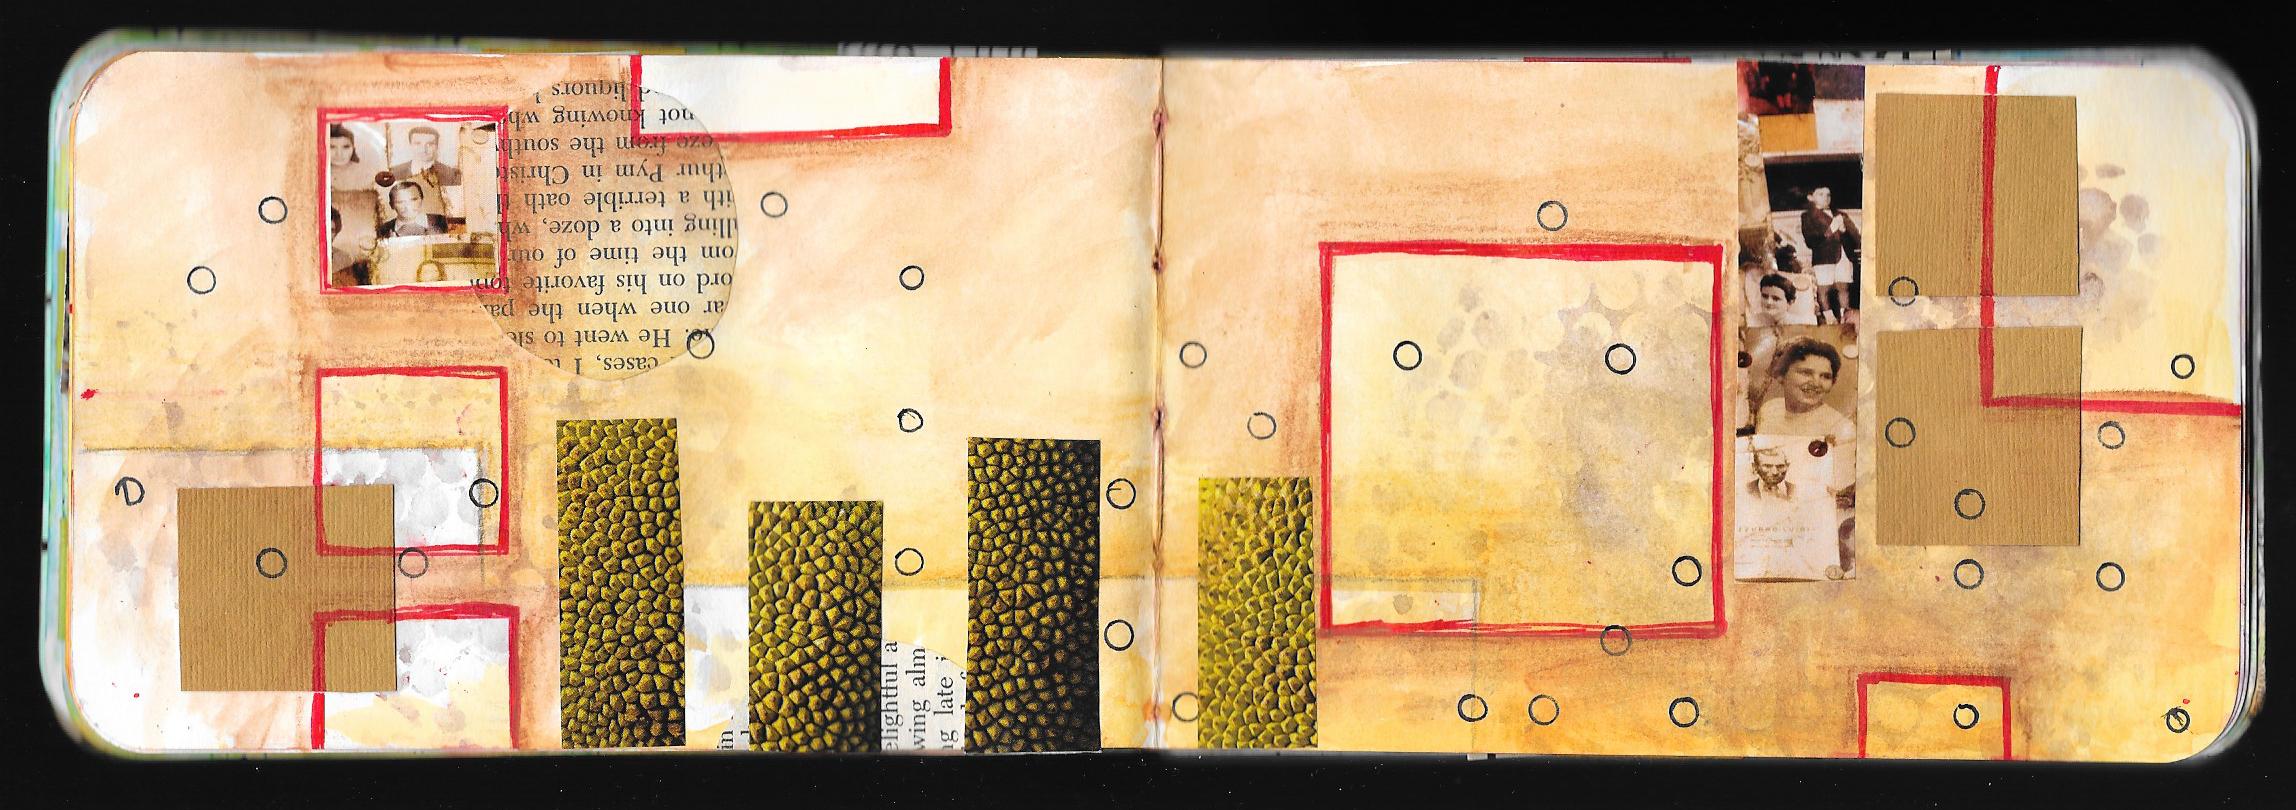 CPB Collage 4.jpeg